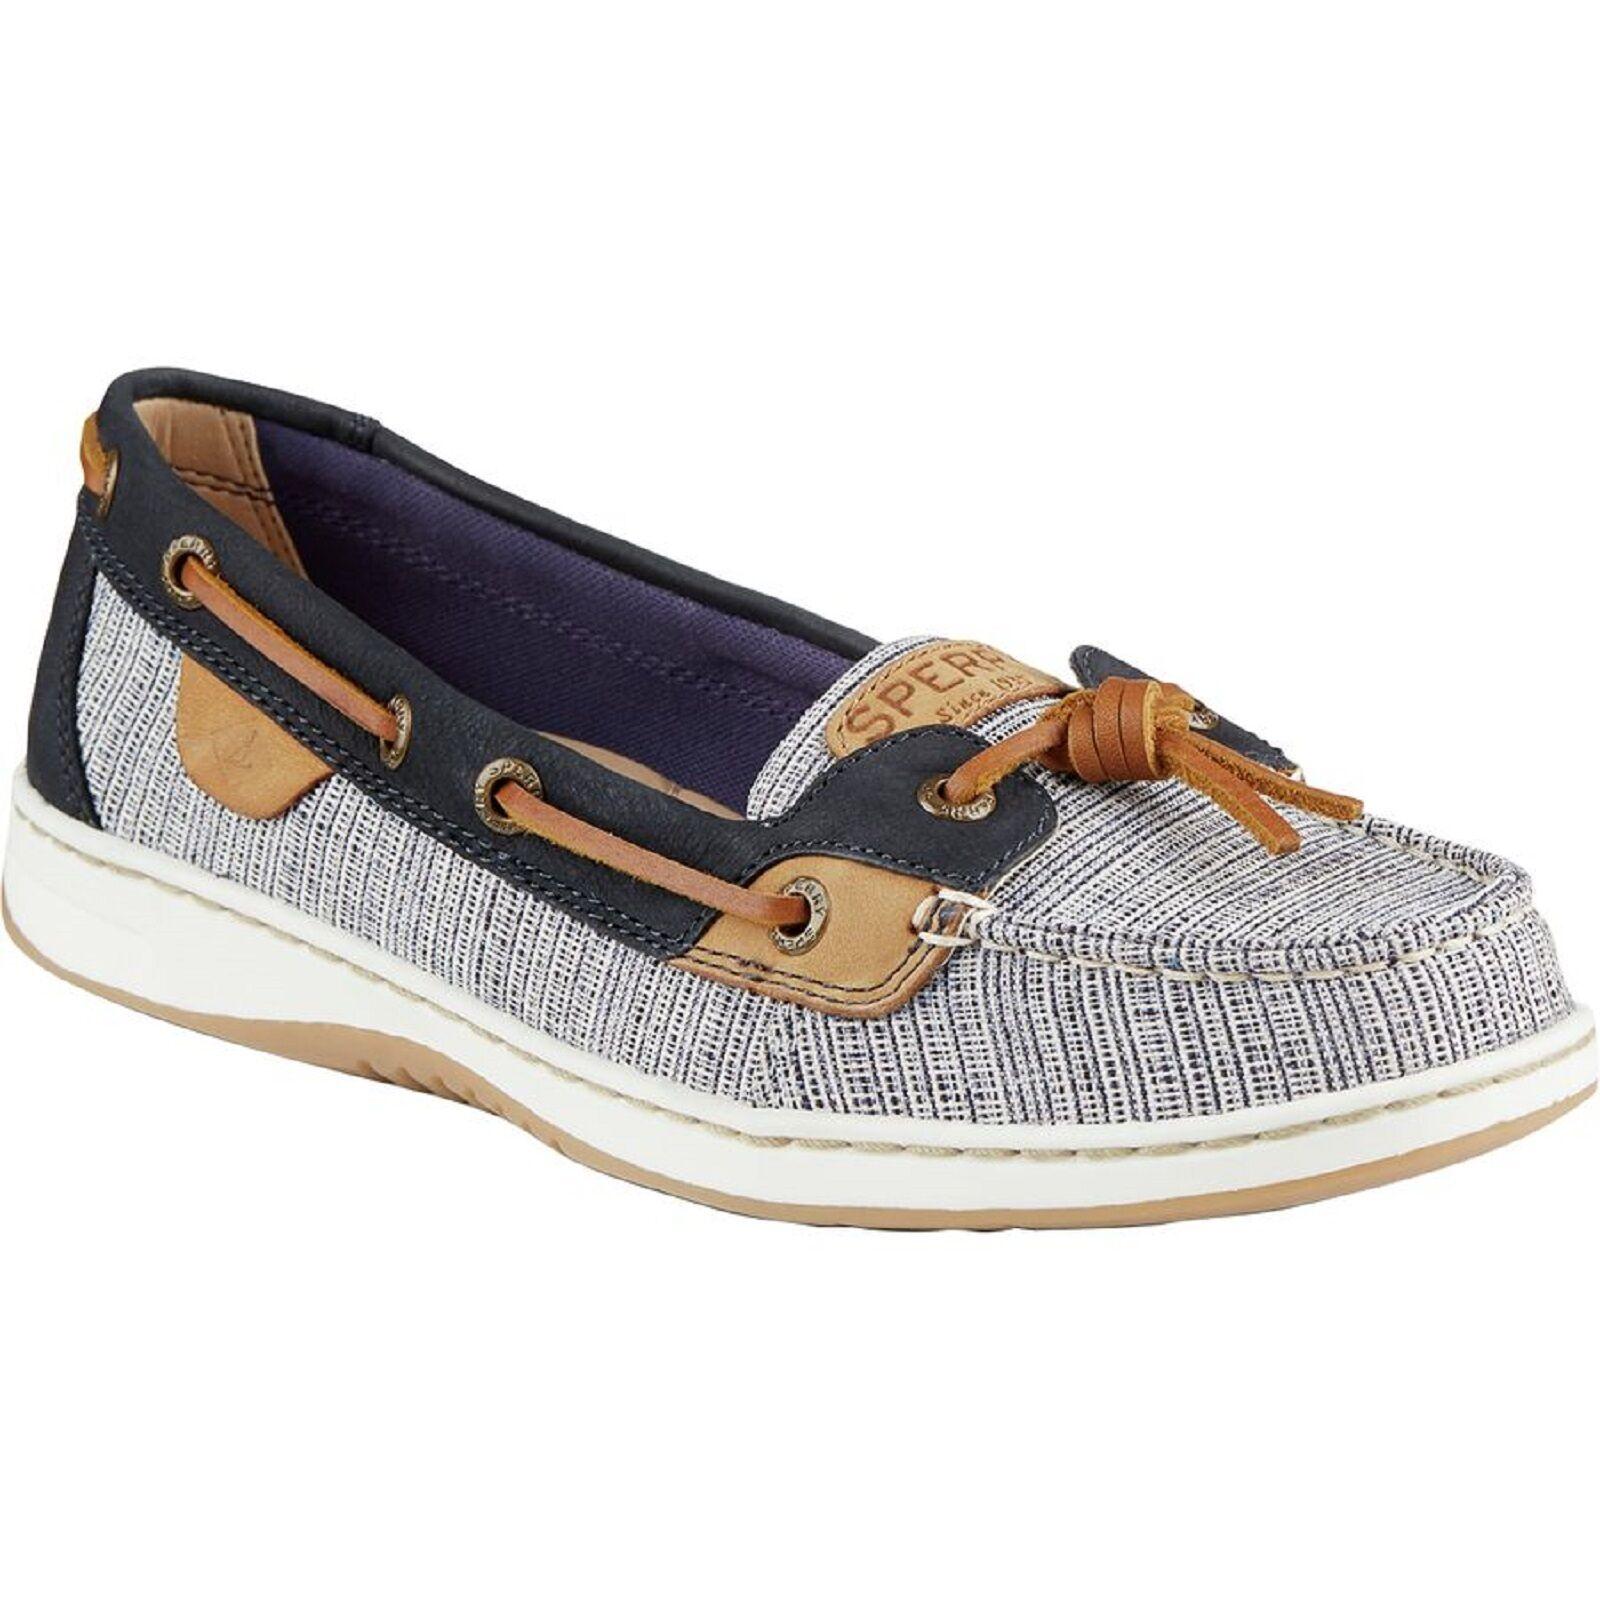 SPERRY 'Dunefish Crosshatch' Navy Wht Brn Ladies  Boat shoes  Sz. 9.5 M NIB